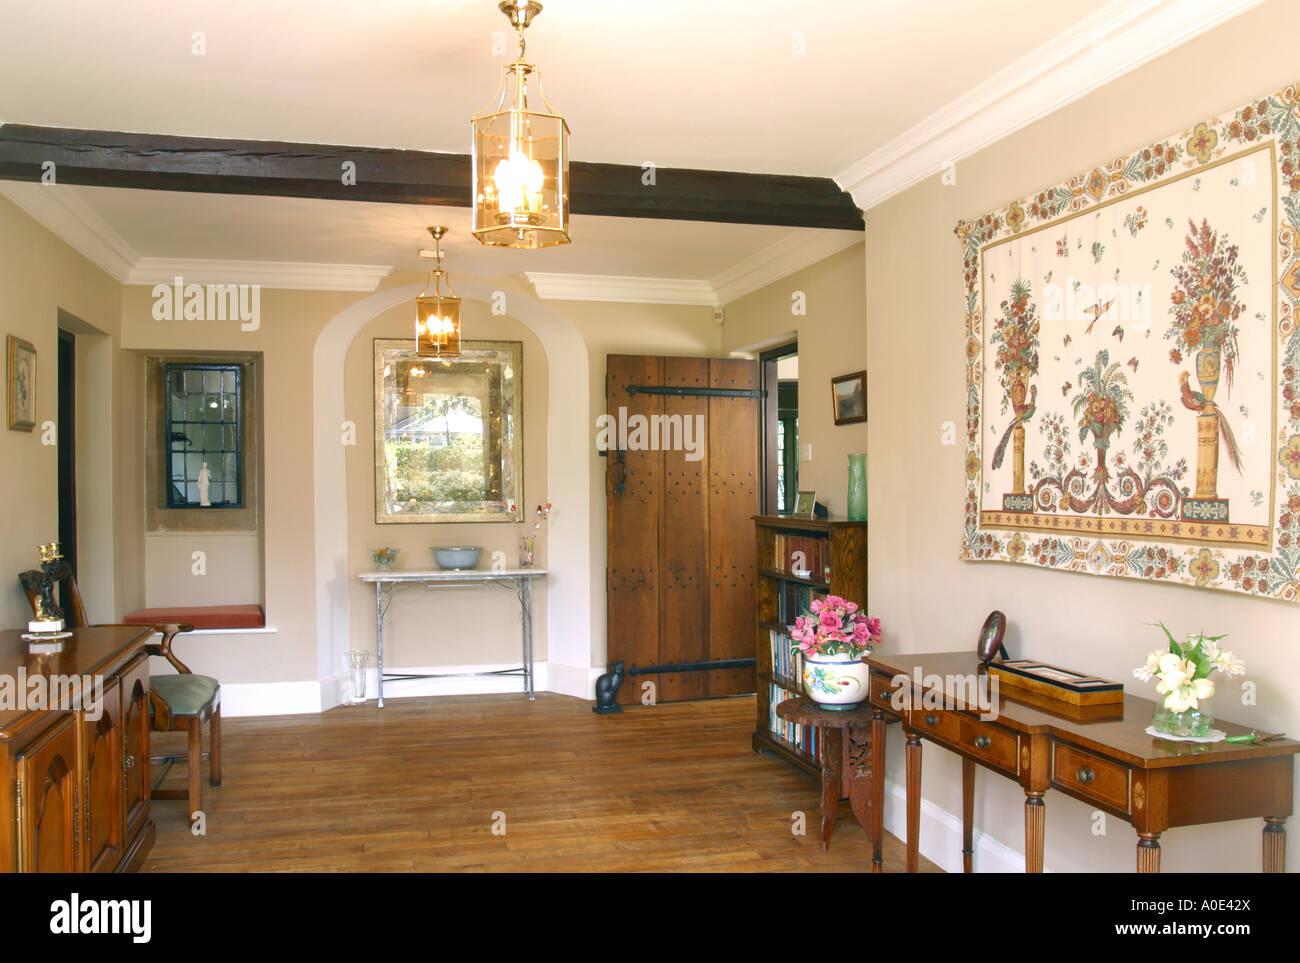 UK property, house interior, entrance hall. - Stock Image